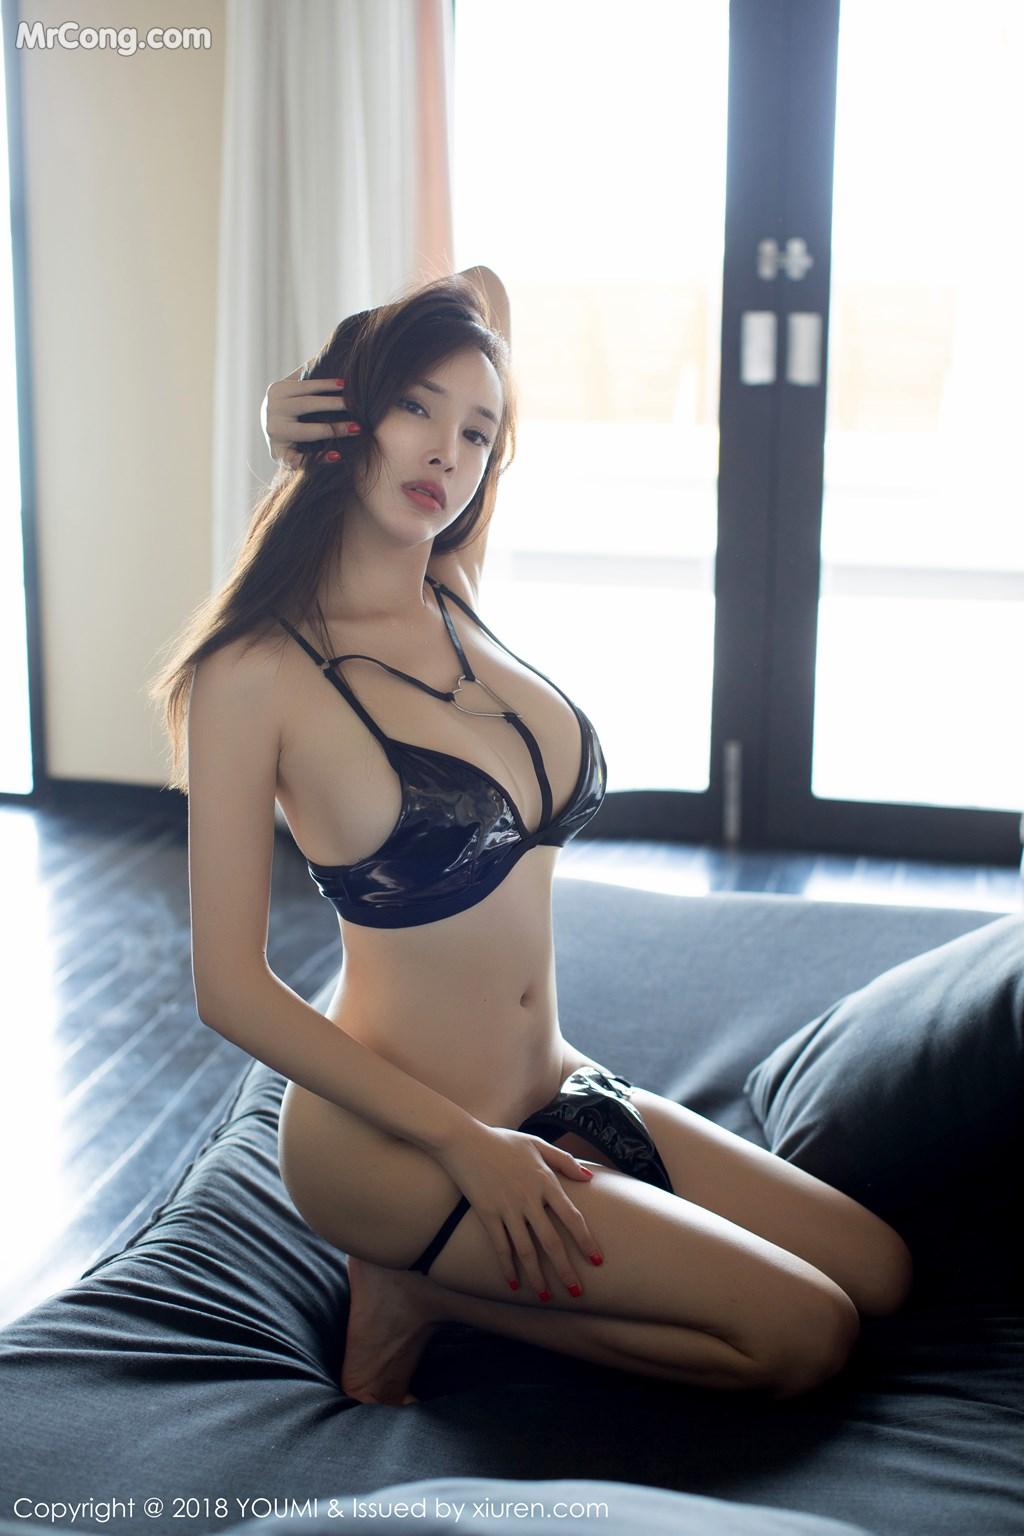 Image YouMi-Vol.237-Tu-Fei-Yuan-Ai-Cuo-Qiong-MrCong.com-009 in post YouMi Vol.237: Người mẫu 奶瓶土肥圆 (46 ảnh)